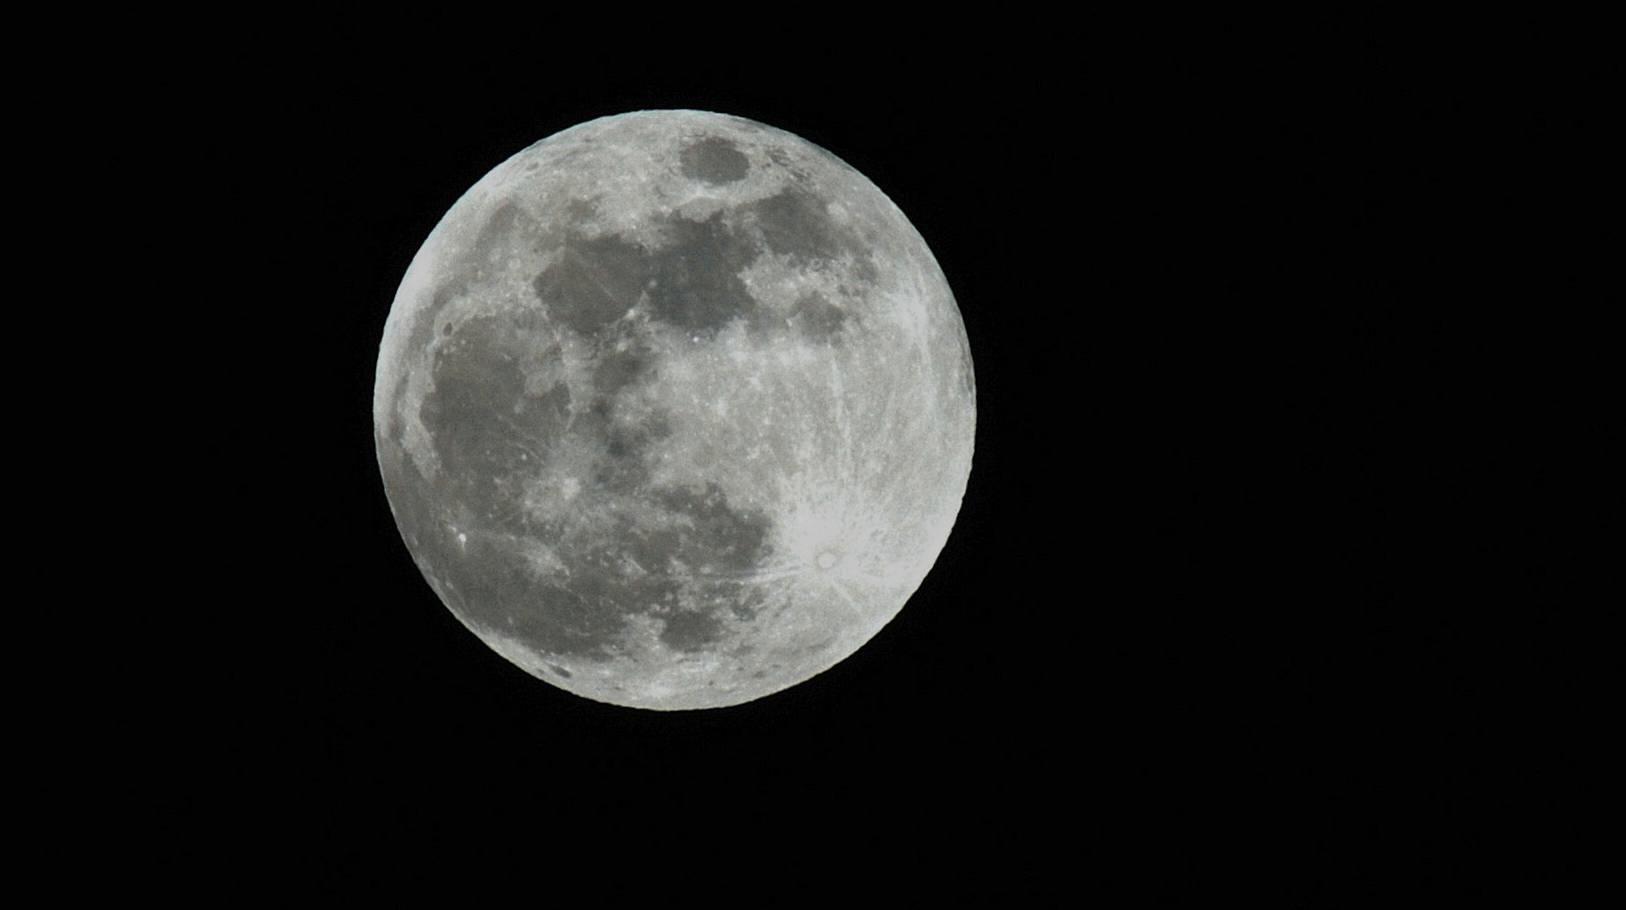 http://coma.su/i/moon.jpg